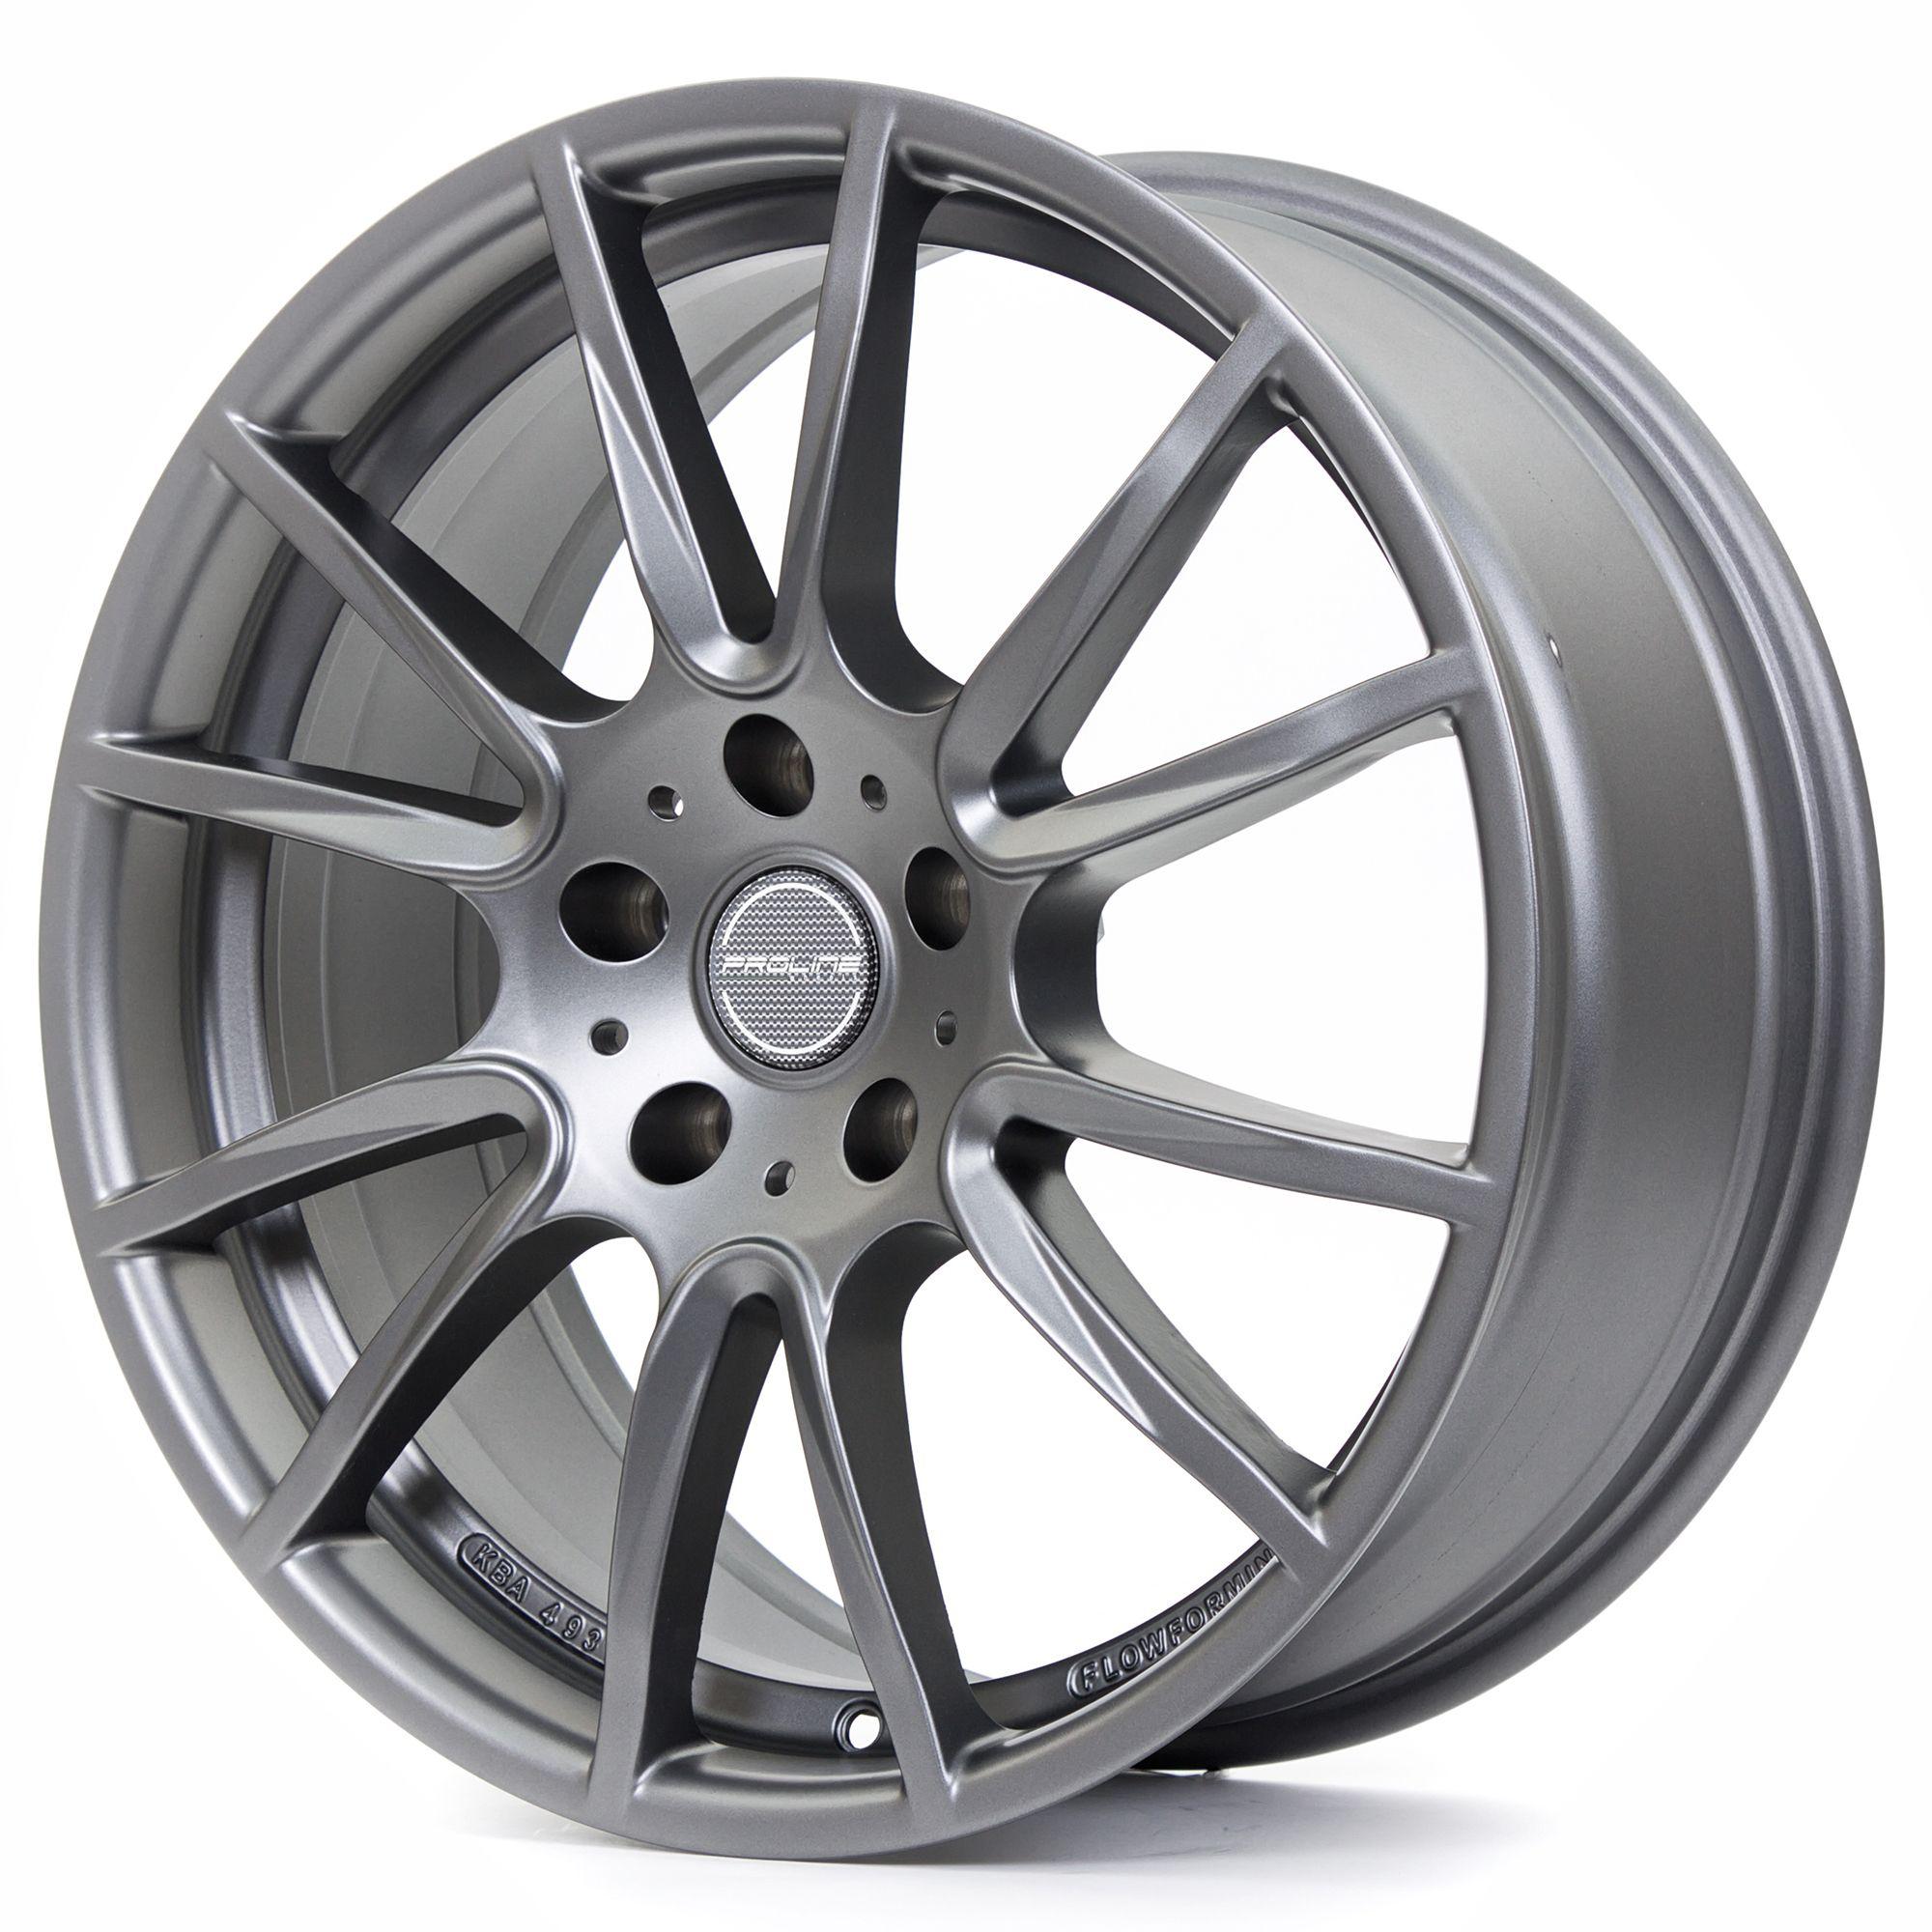 proline wheels pxf felgen matt grey in 16 zoll. Black Bedroom Furniture Sets. Home Design Ideas